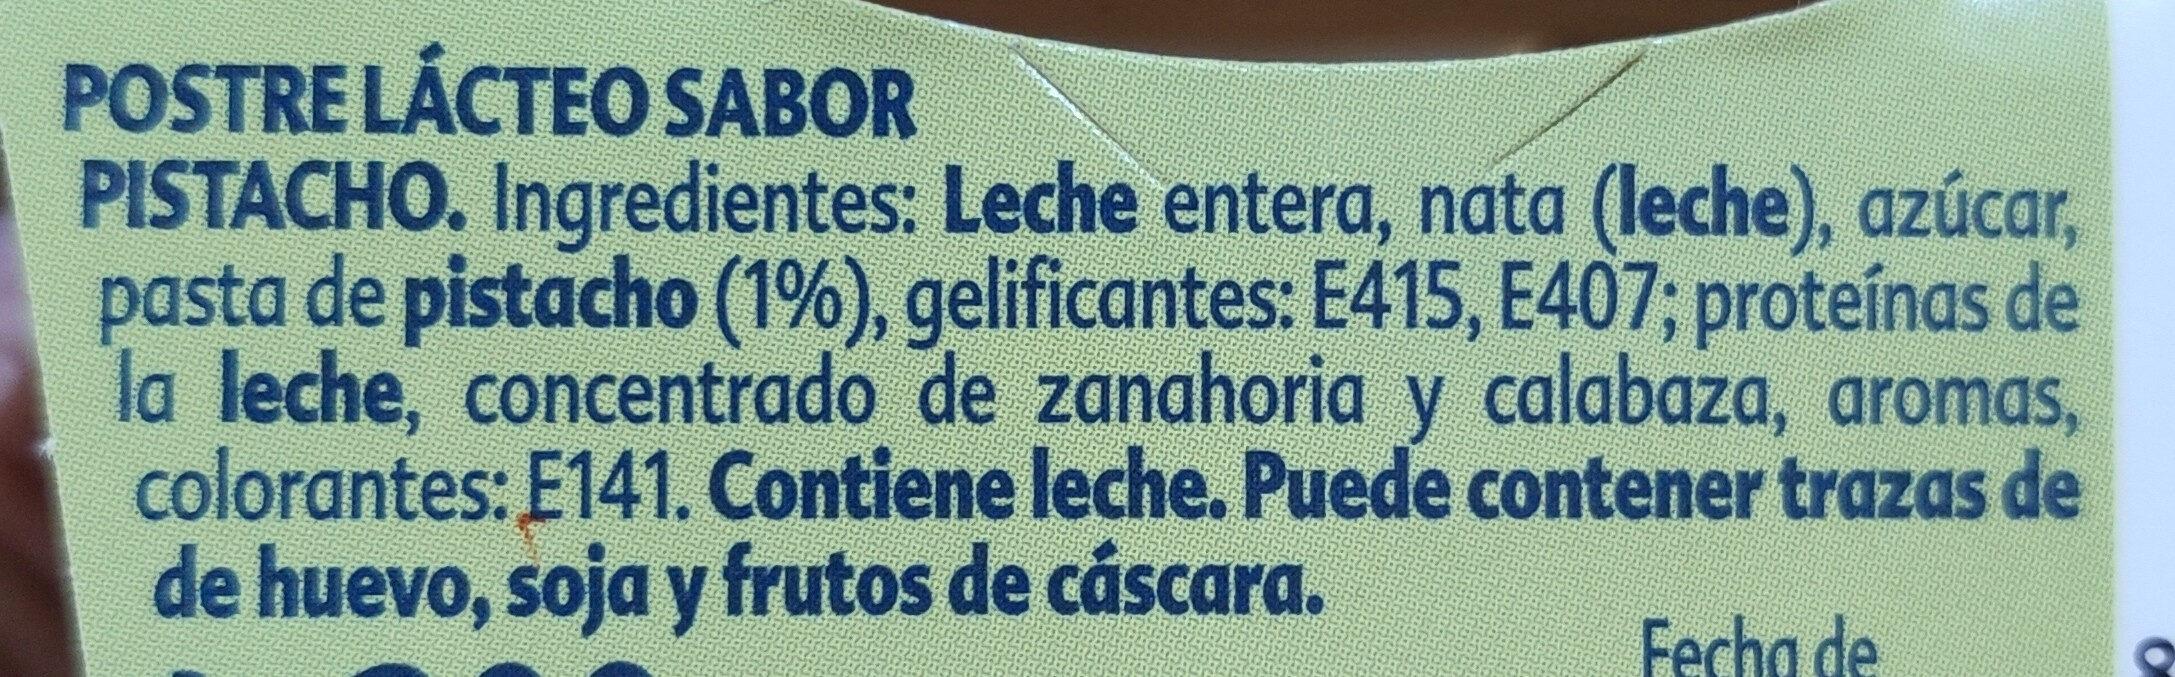 Gourmand pistacho - Ingredientes - es